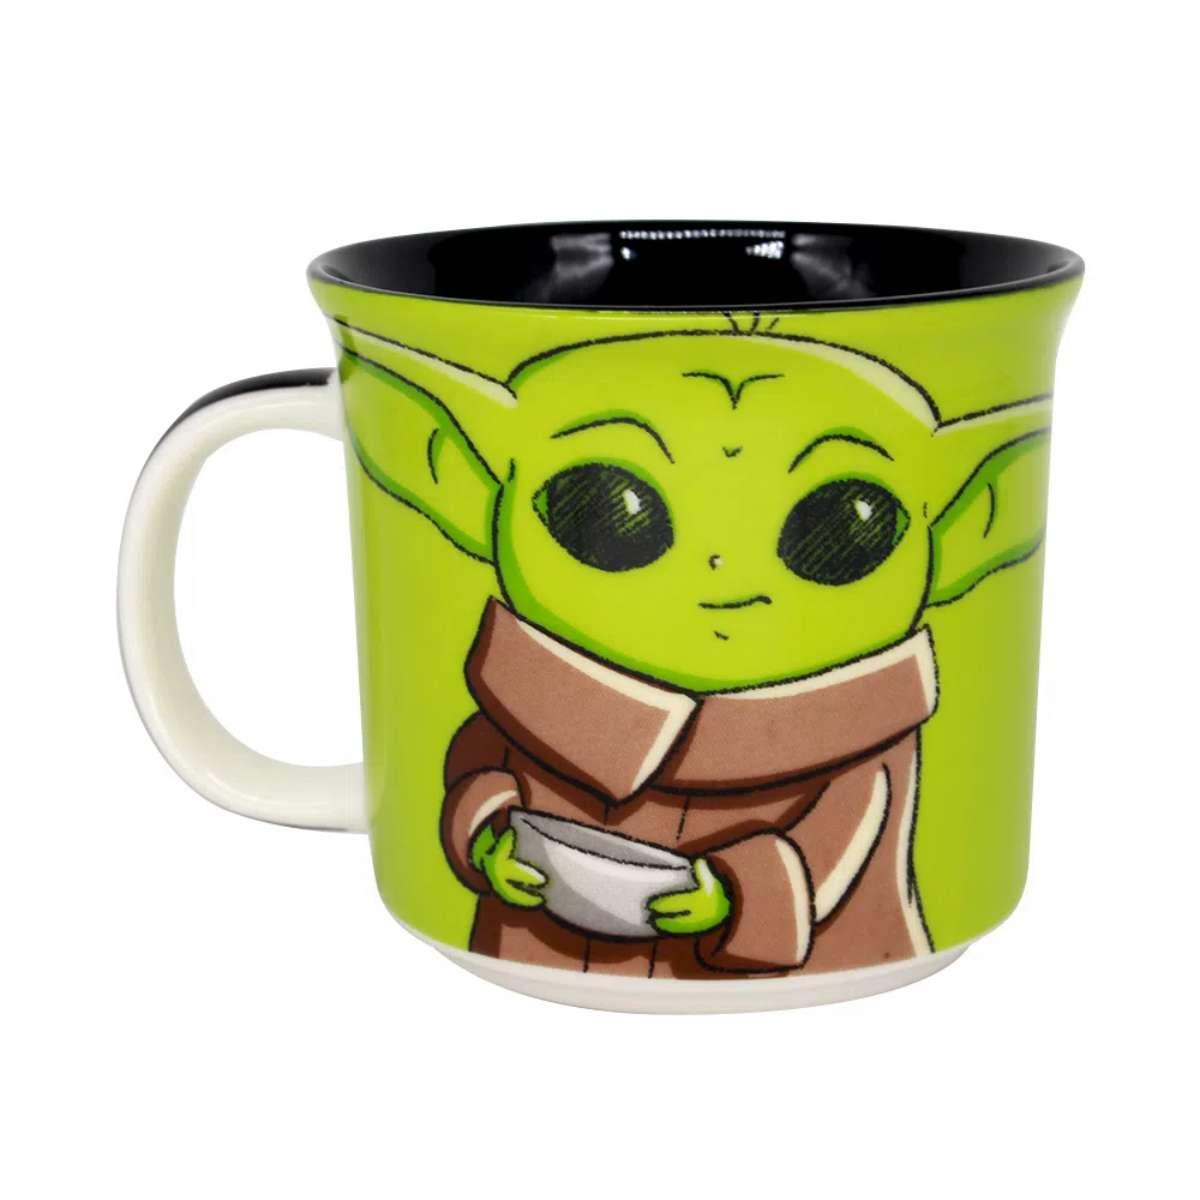 Caneca Baby Yoda Mestre Jedi Star Wars Guerra nas Estrelas